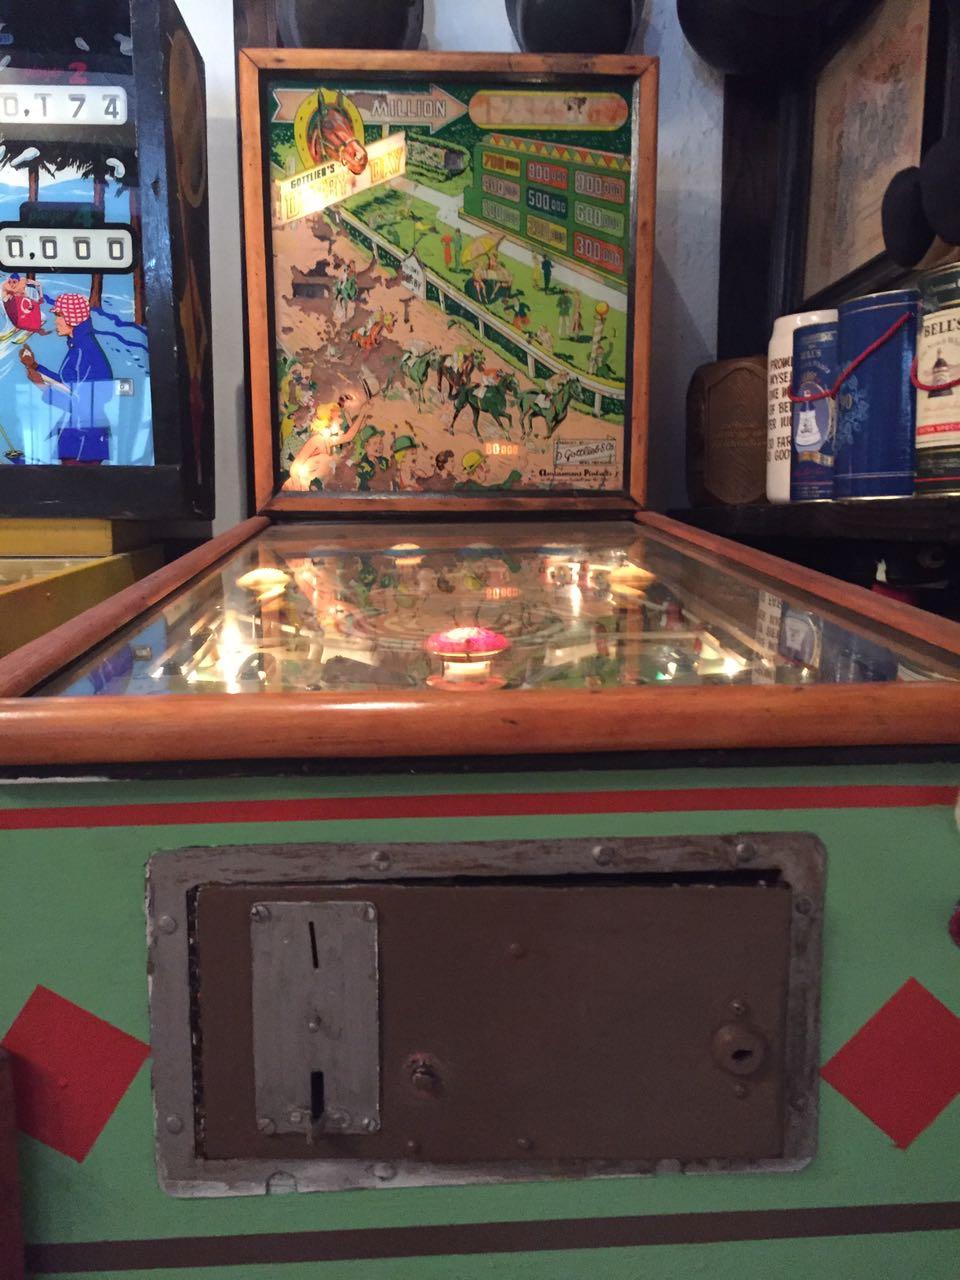 Pinball Machine Wanted for Cash